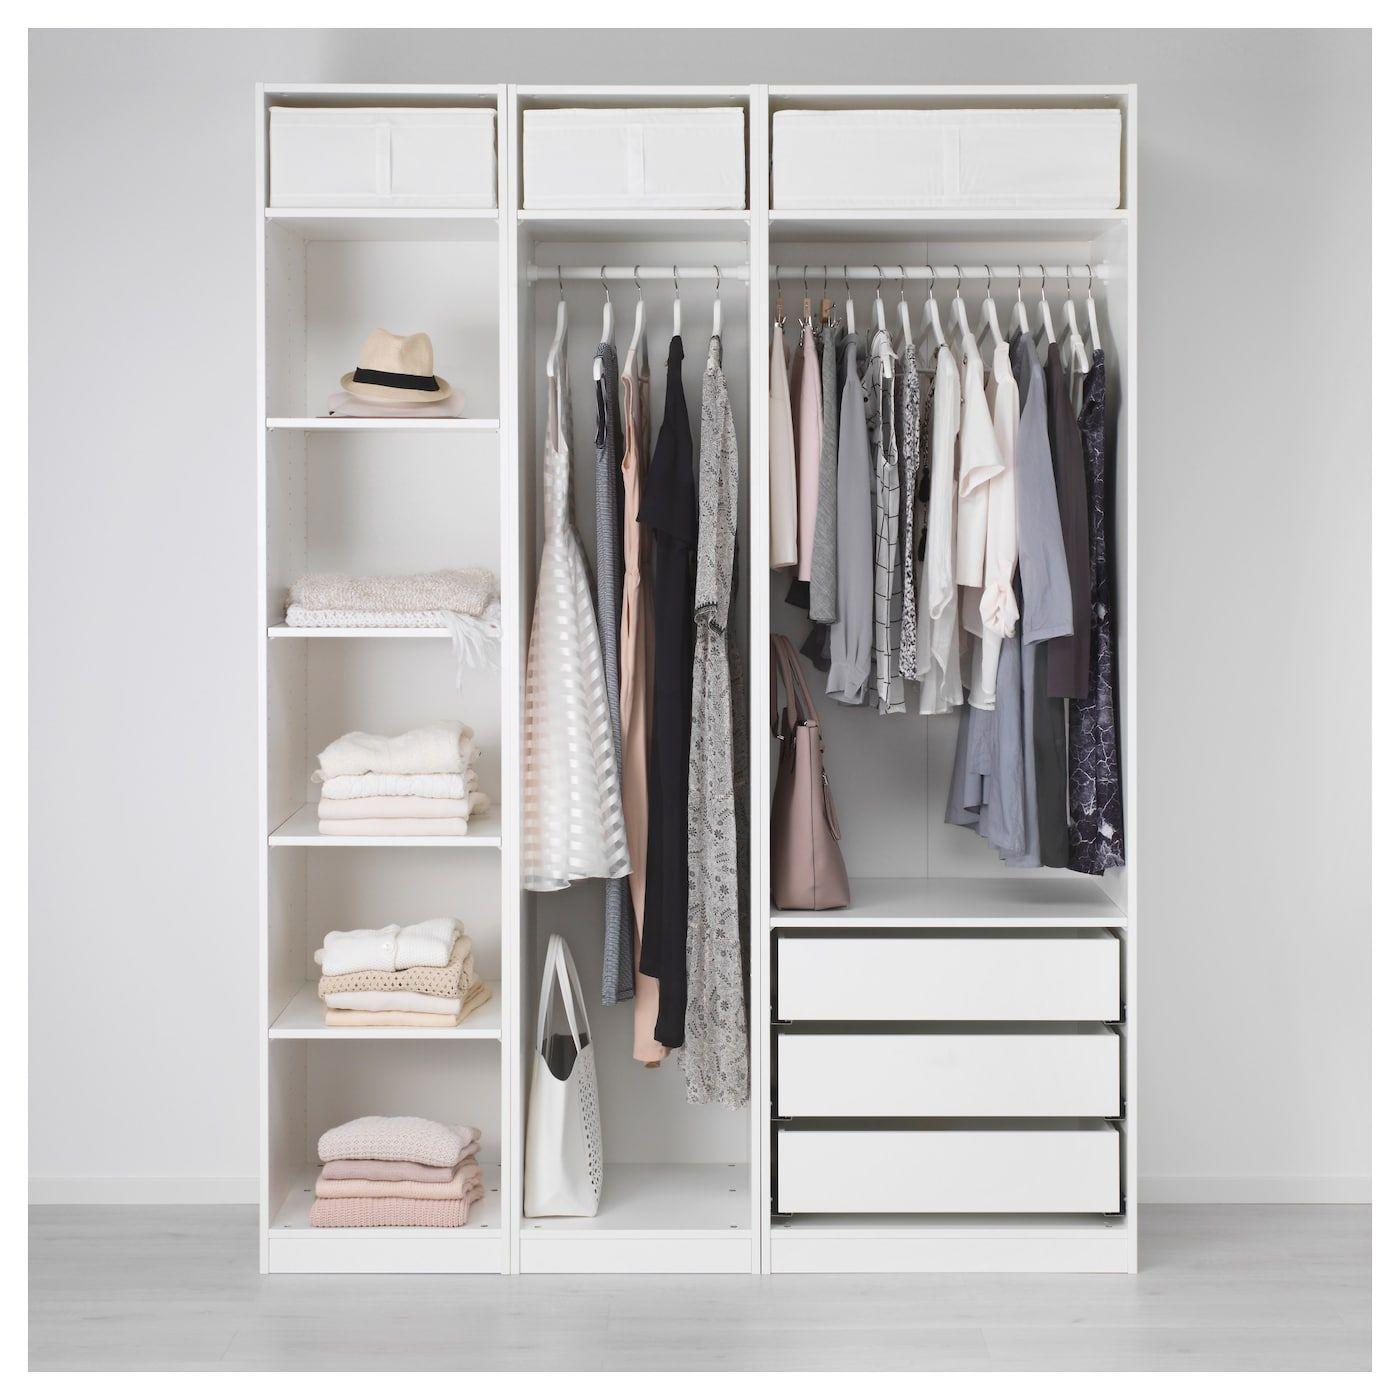 Pax Wardrobe White 68 7 8x22 7 8x93 1 8 Bedroom Cupboards